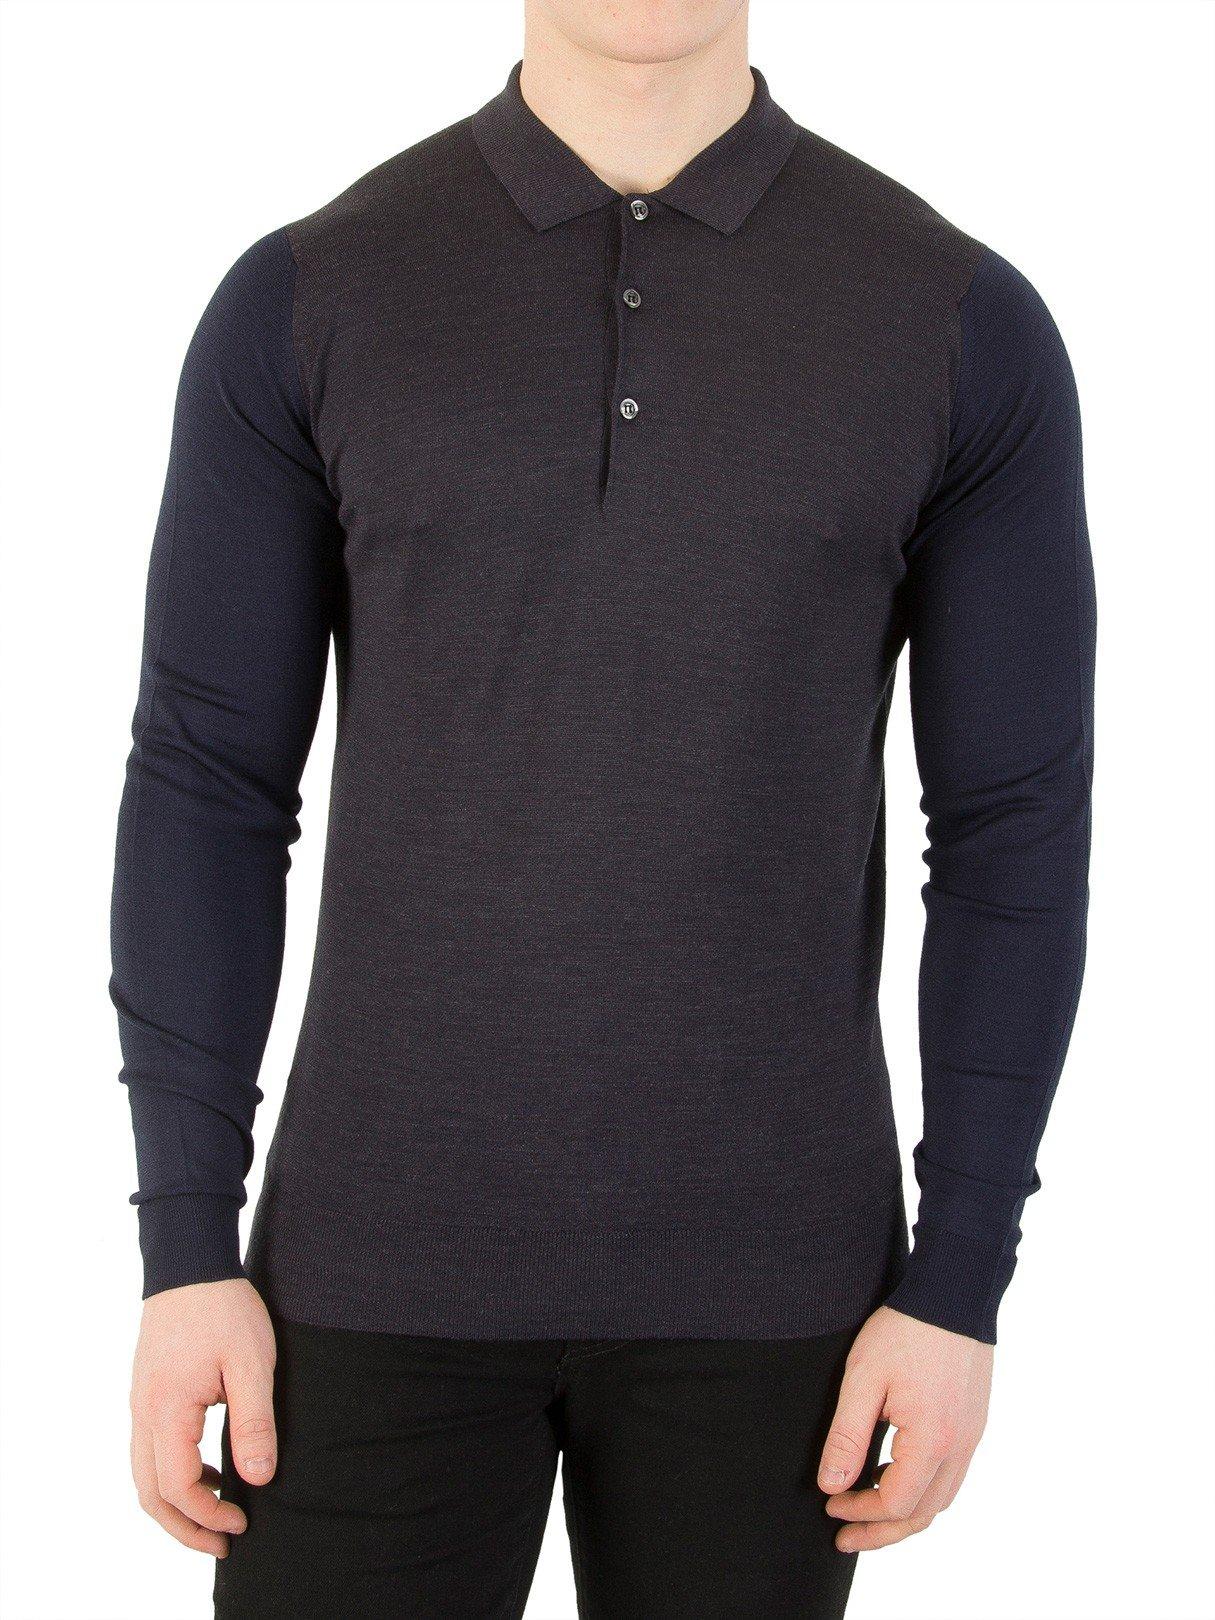 John Smedley Men's Brightgate Longsleeved Colour Block Polo Shirt, Green, Large